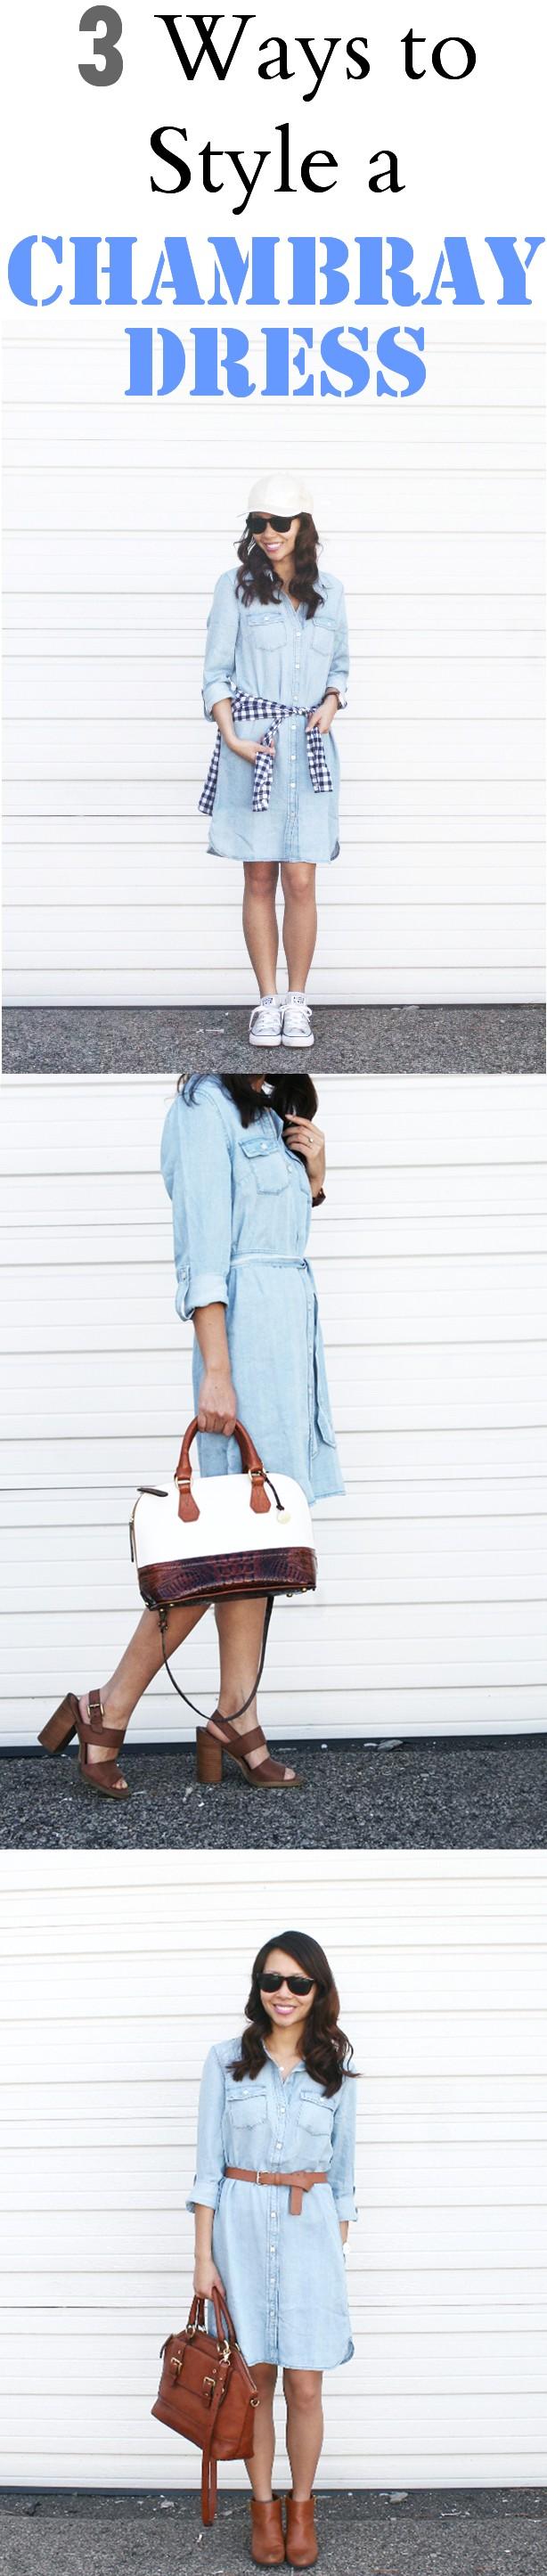 3 ways to style a chambray dress